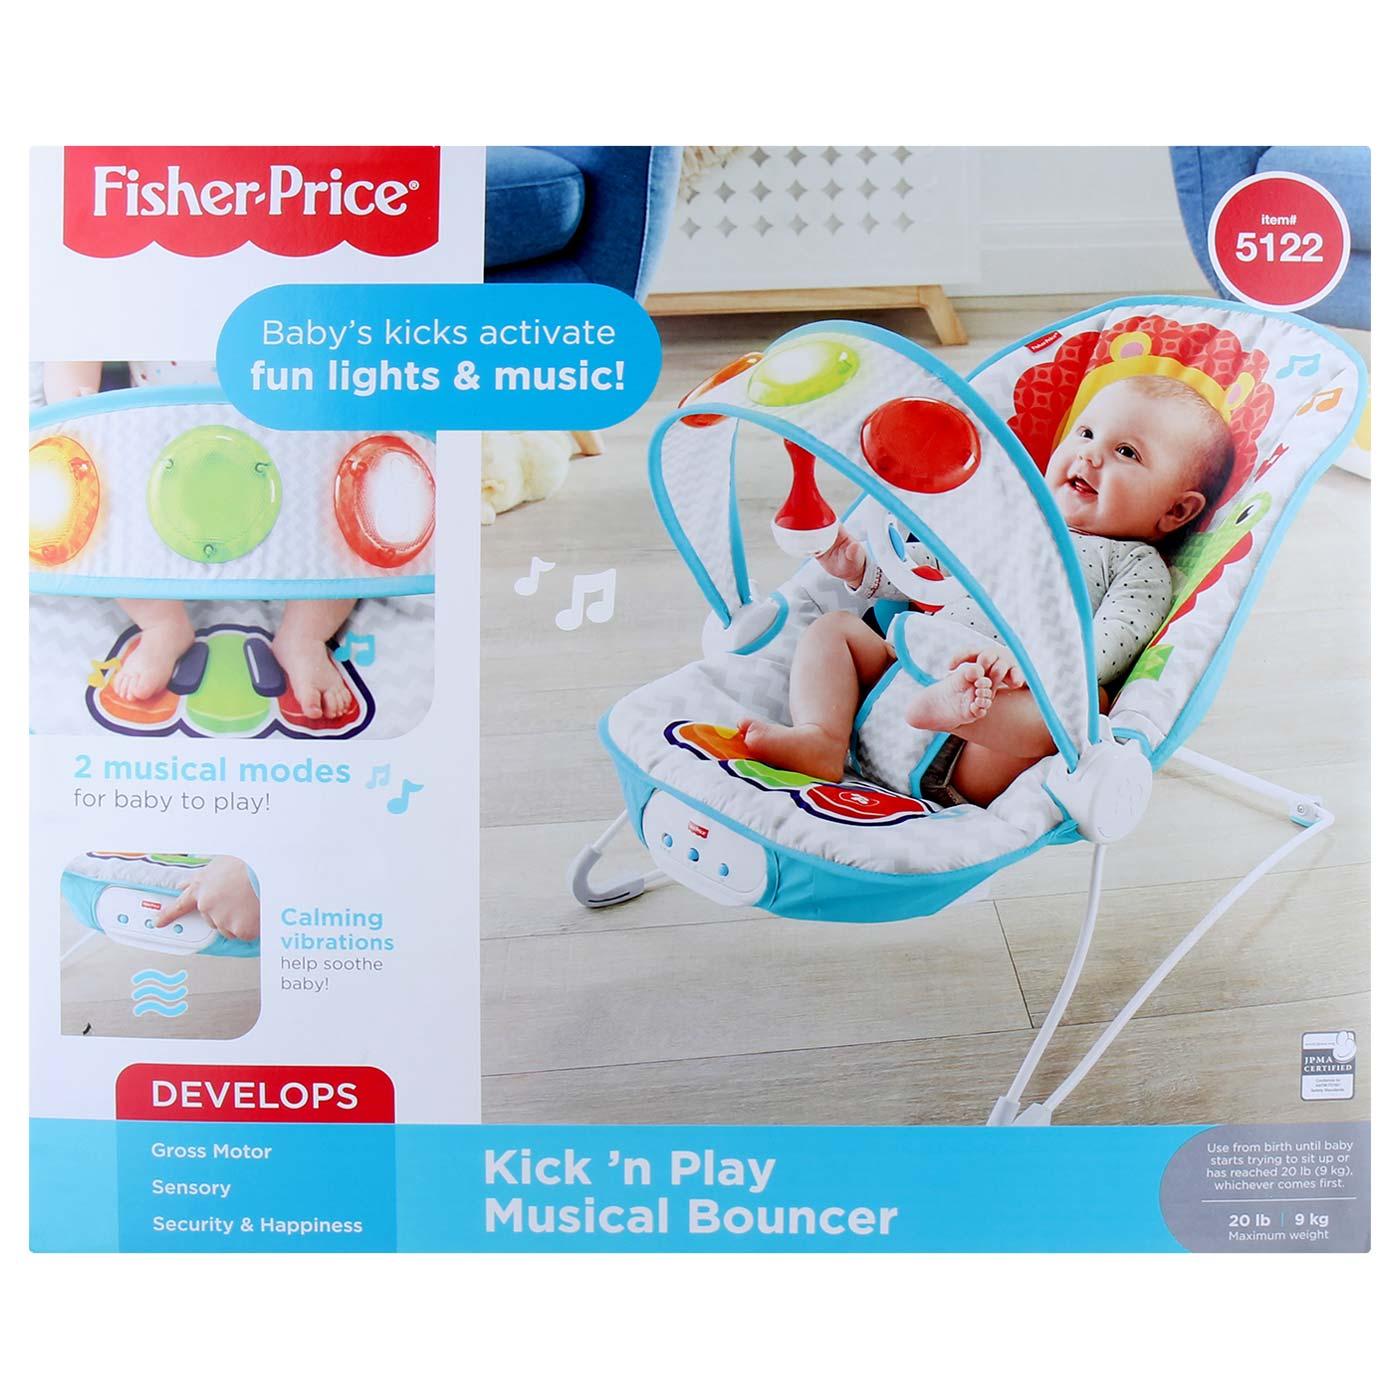 Fisher Price BG RFF Newborn/Toddler Rocker 1